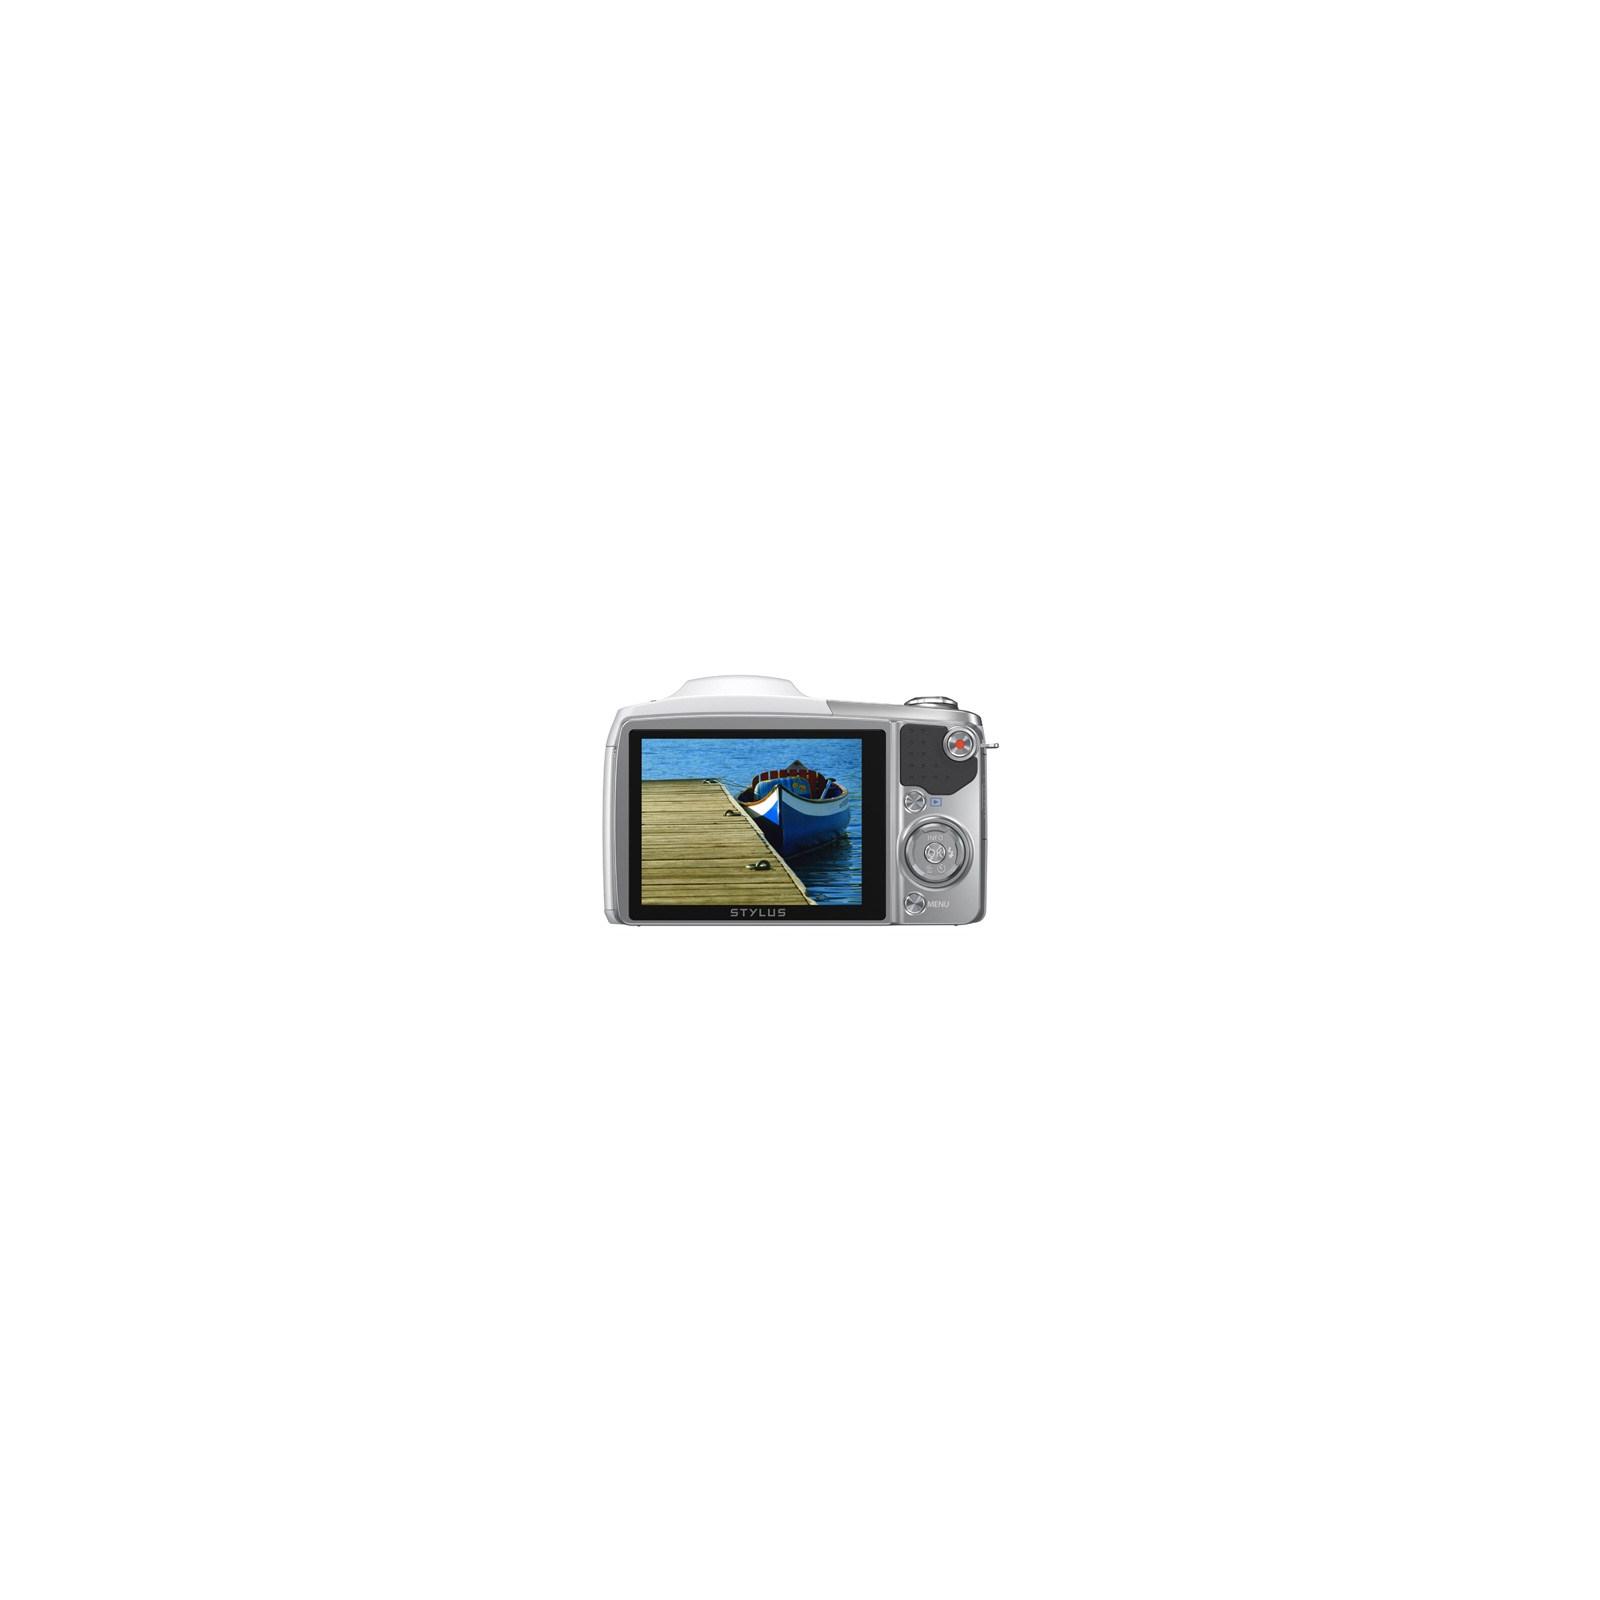 Цифровой фотоаппарат OLYMPUS SZ-16 white (V102100WE000) изображение 2